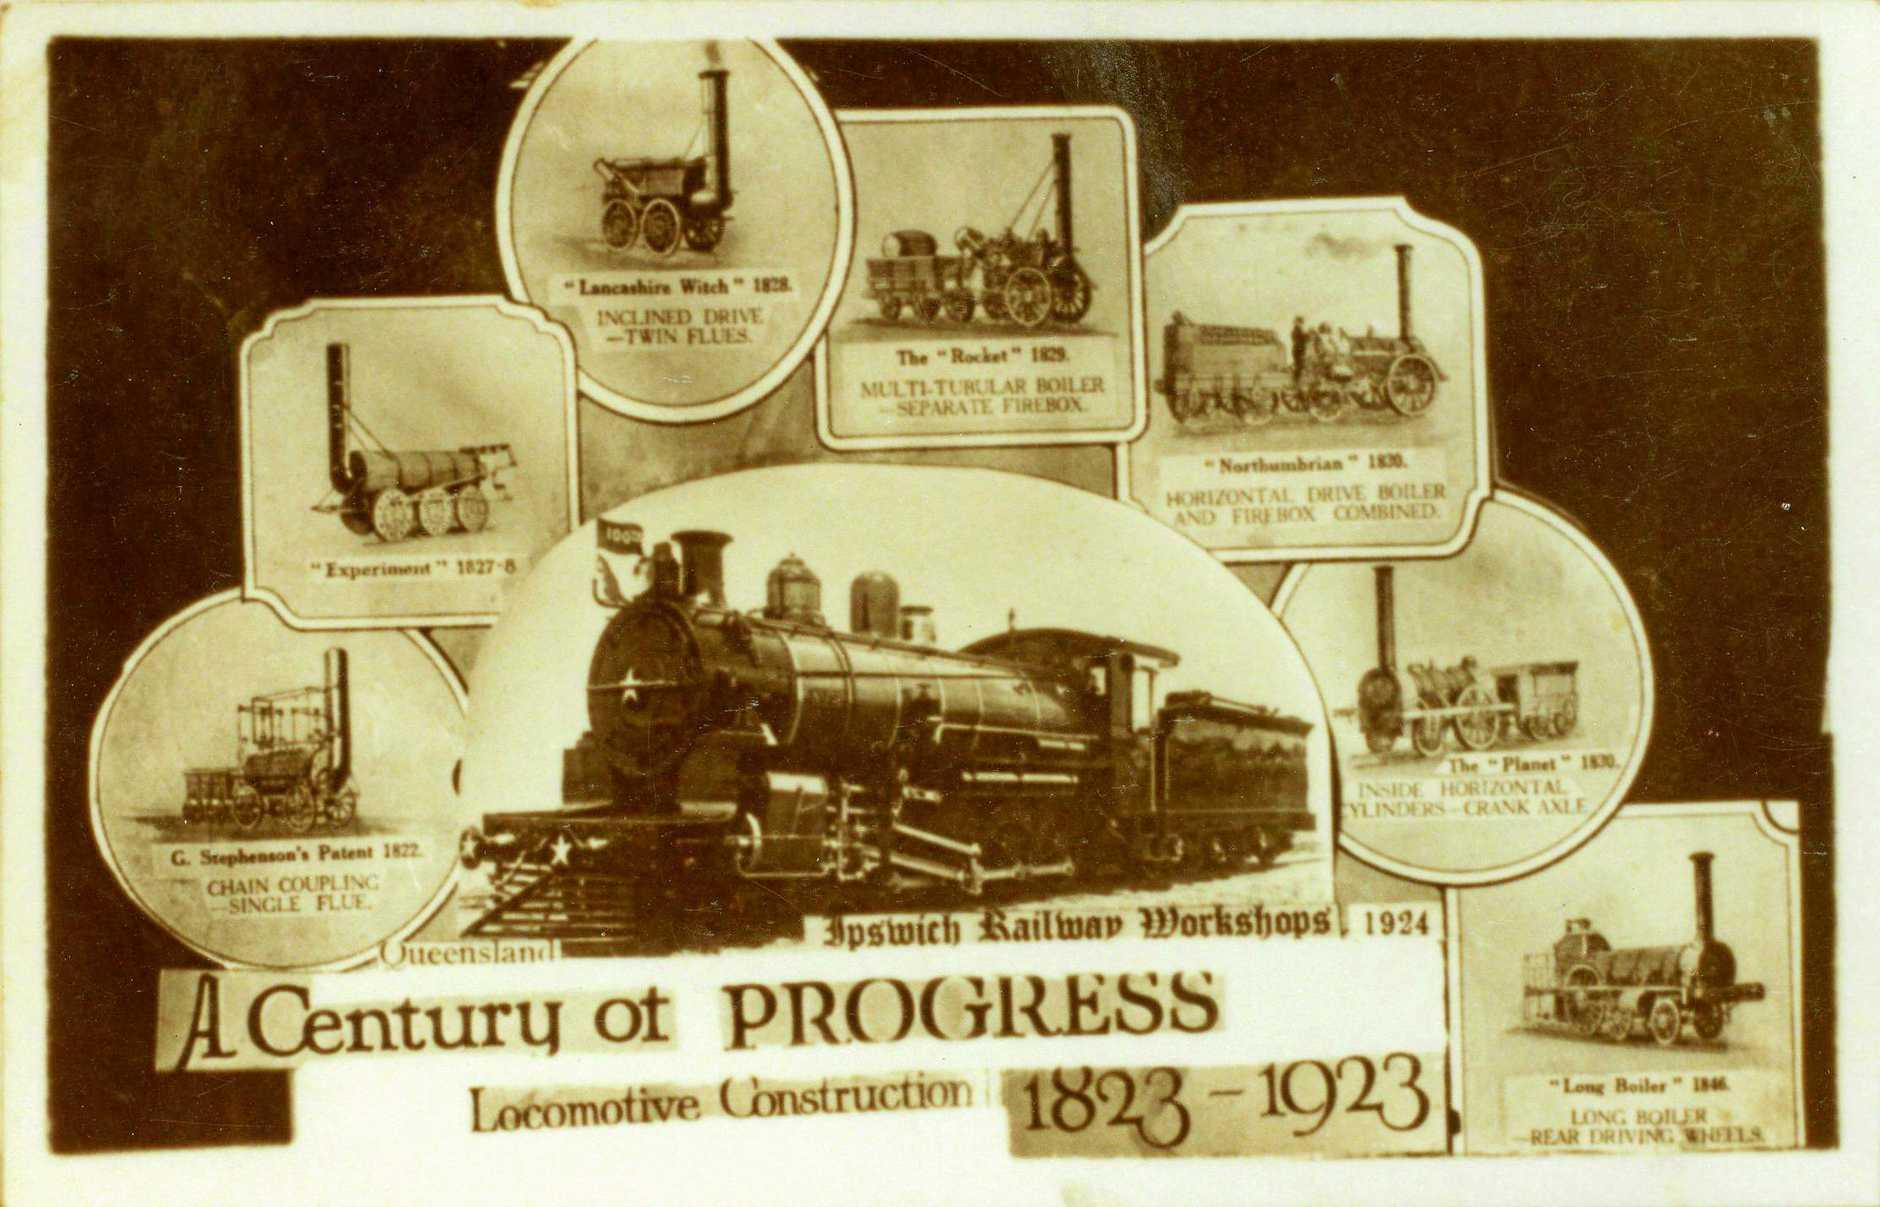 A century of Progress of Locomotive Construction 1823-1923 - Ipswich railway Workshops.